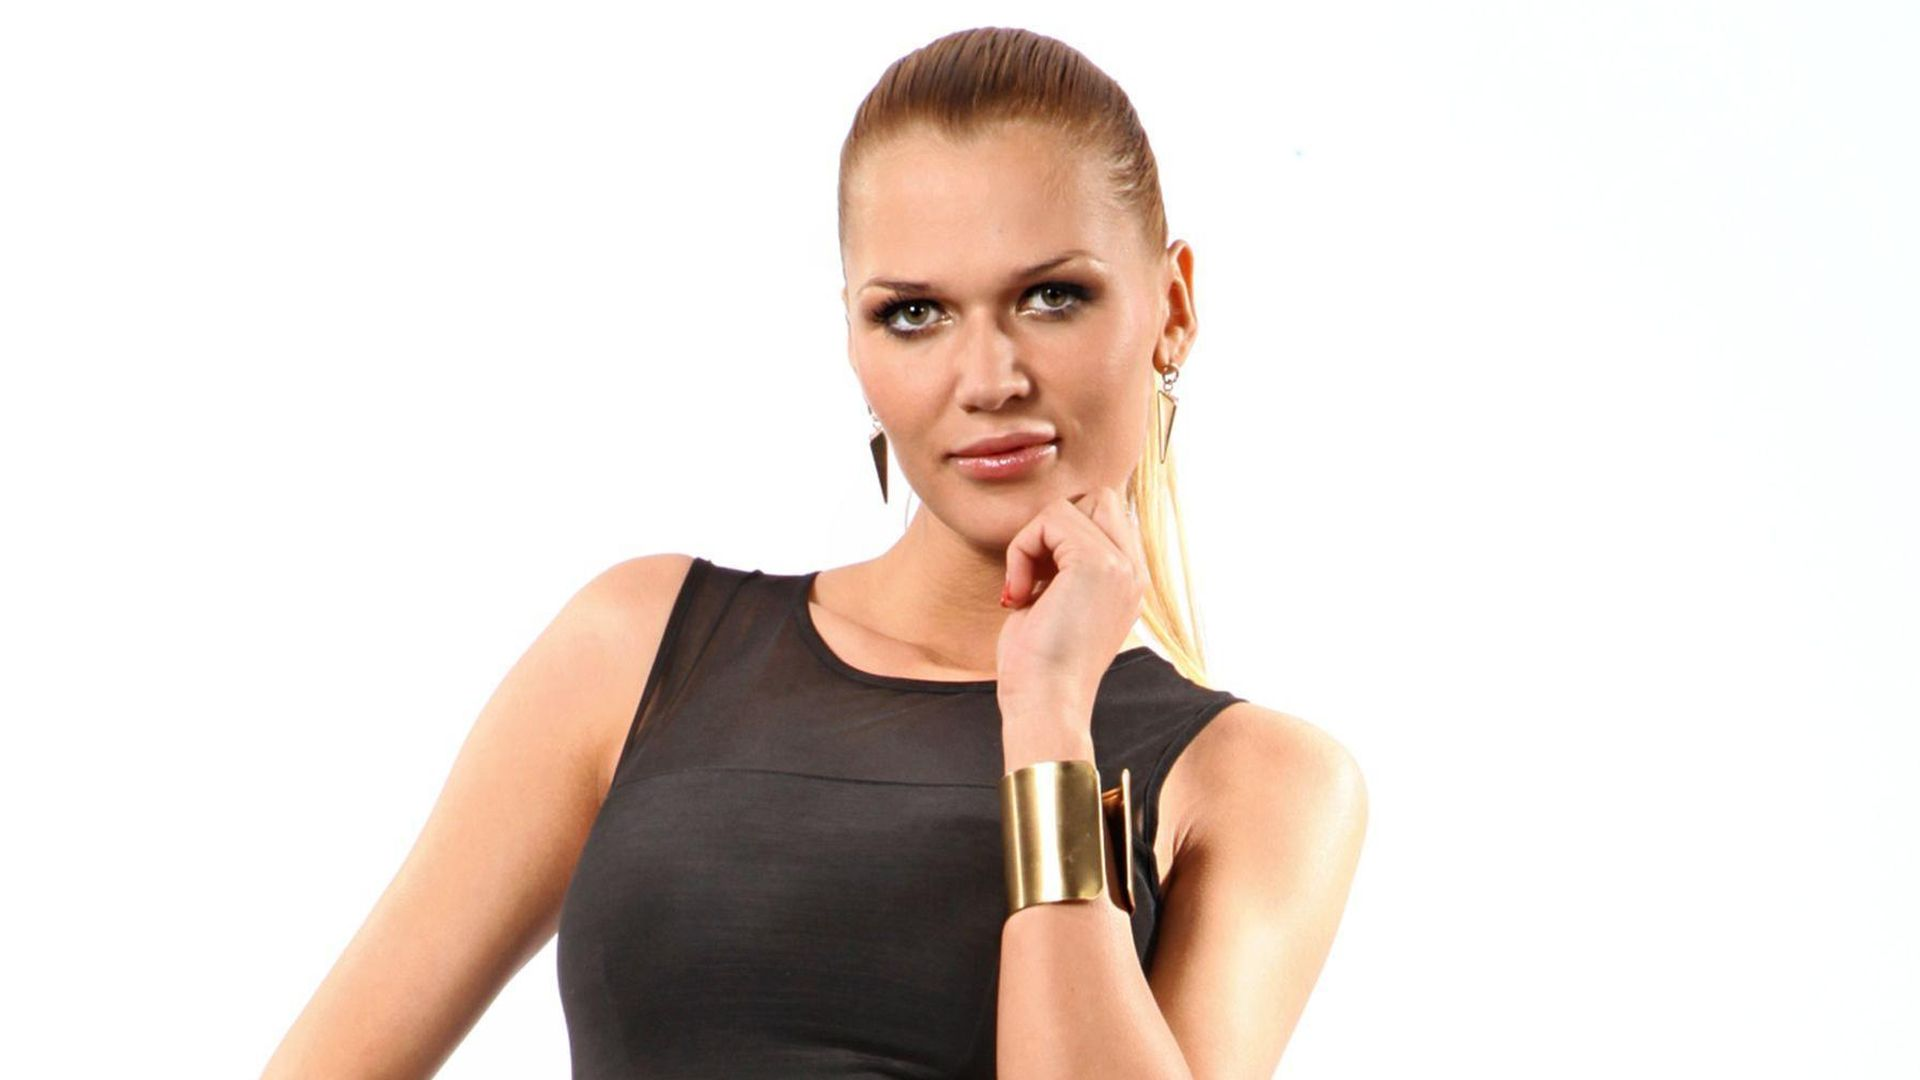 Playboy kulka. 🐈 SARA KULKA NACKT IM PLAYBOY Porn Pictures